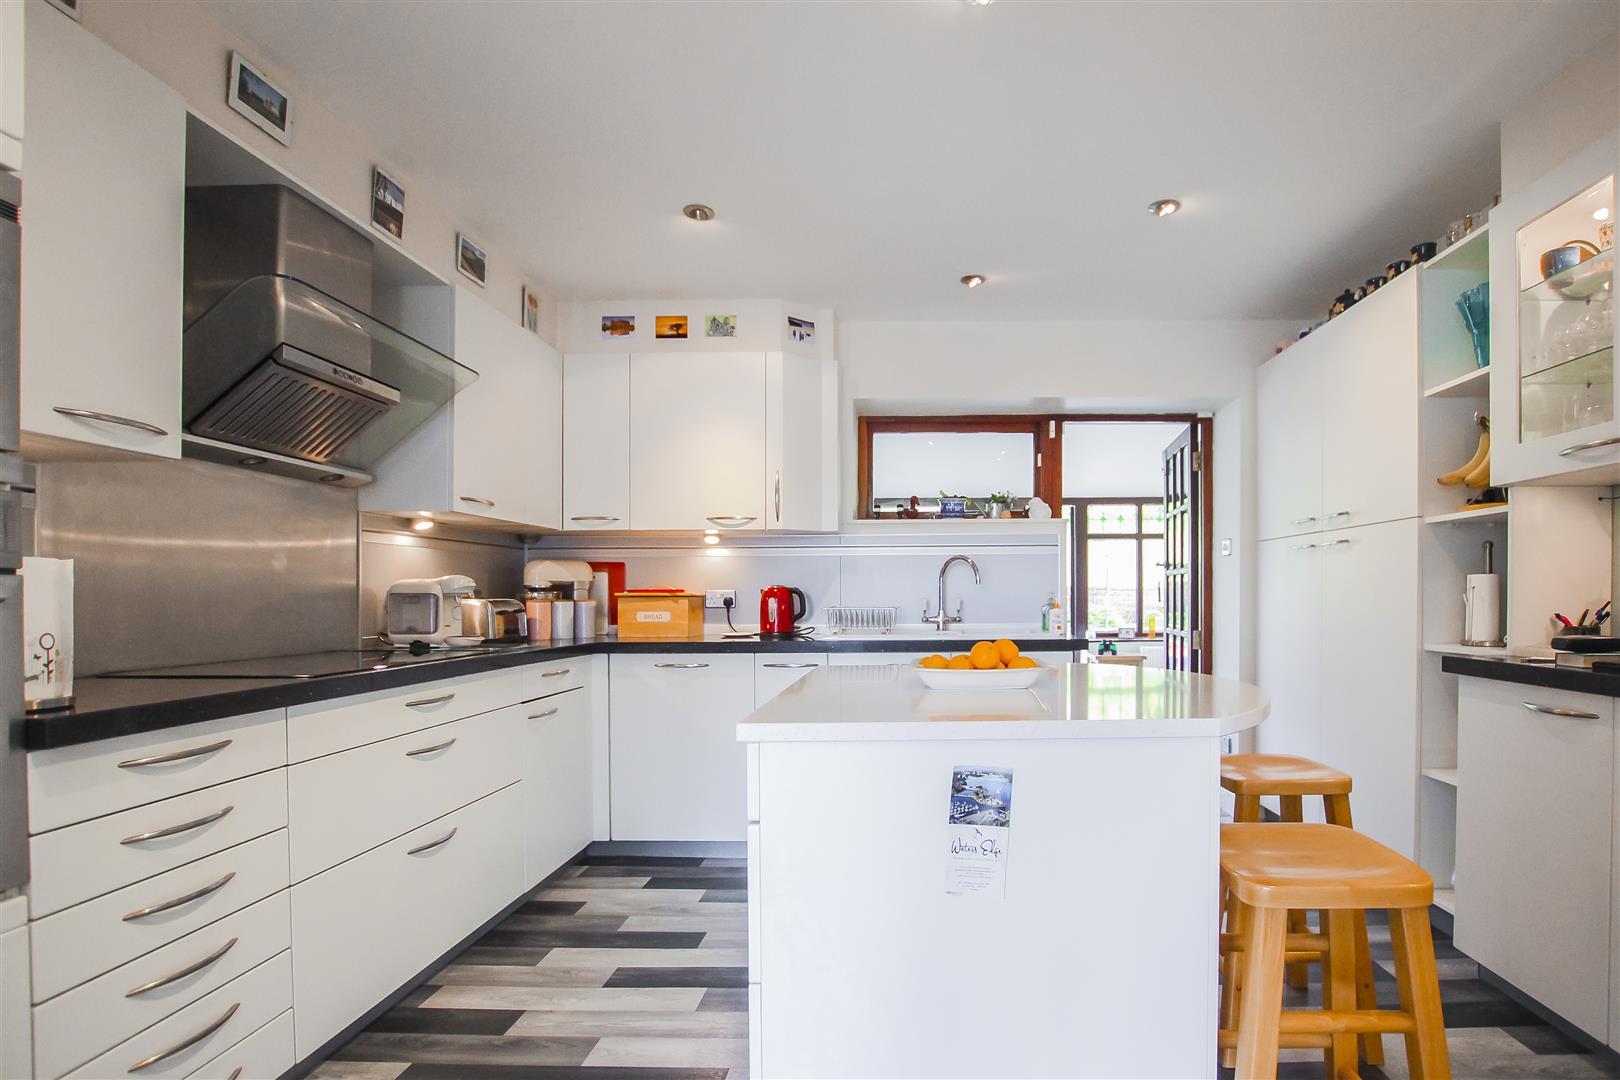 6 Bedroom Detached House For Sale - Annex Kitchen